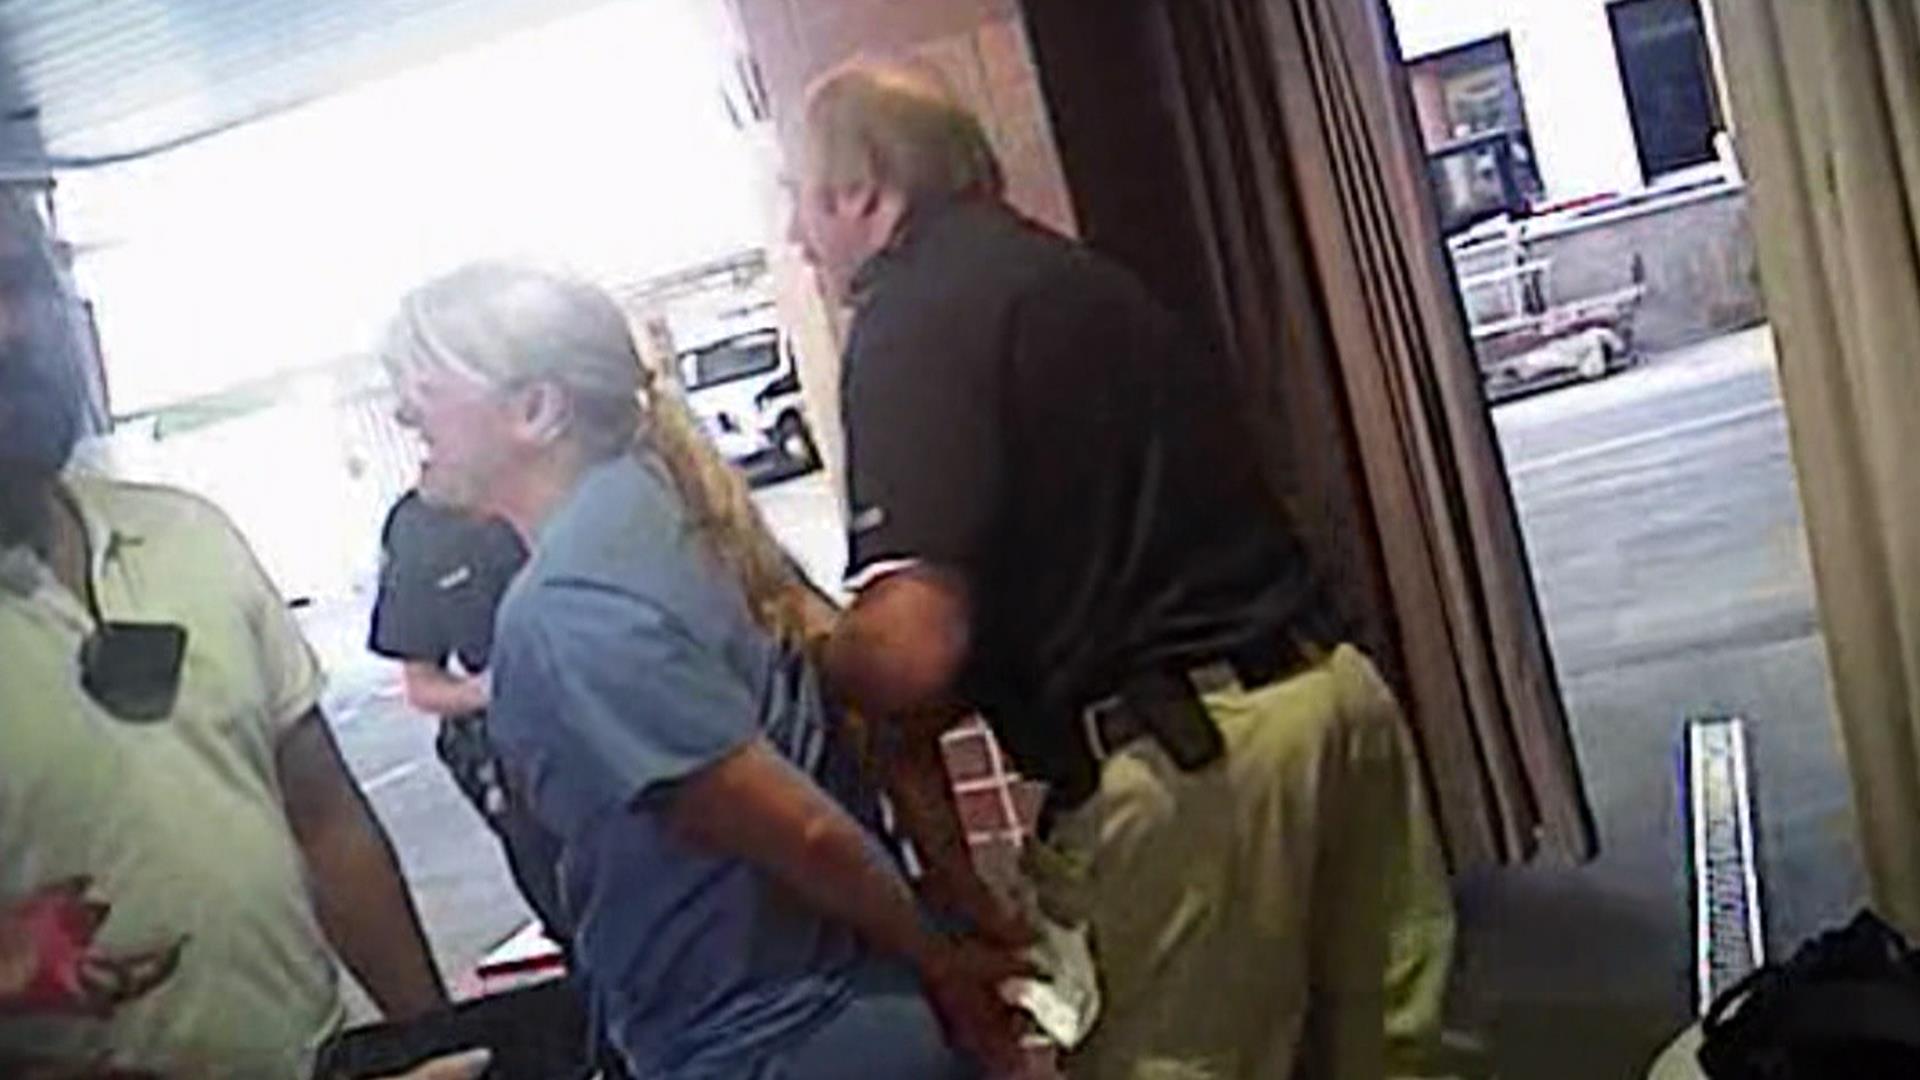 Patient at Center of Utah Nurse's High-Profile Arrest Over Blood Draw Dies